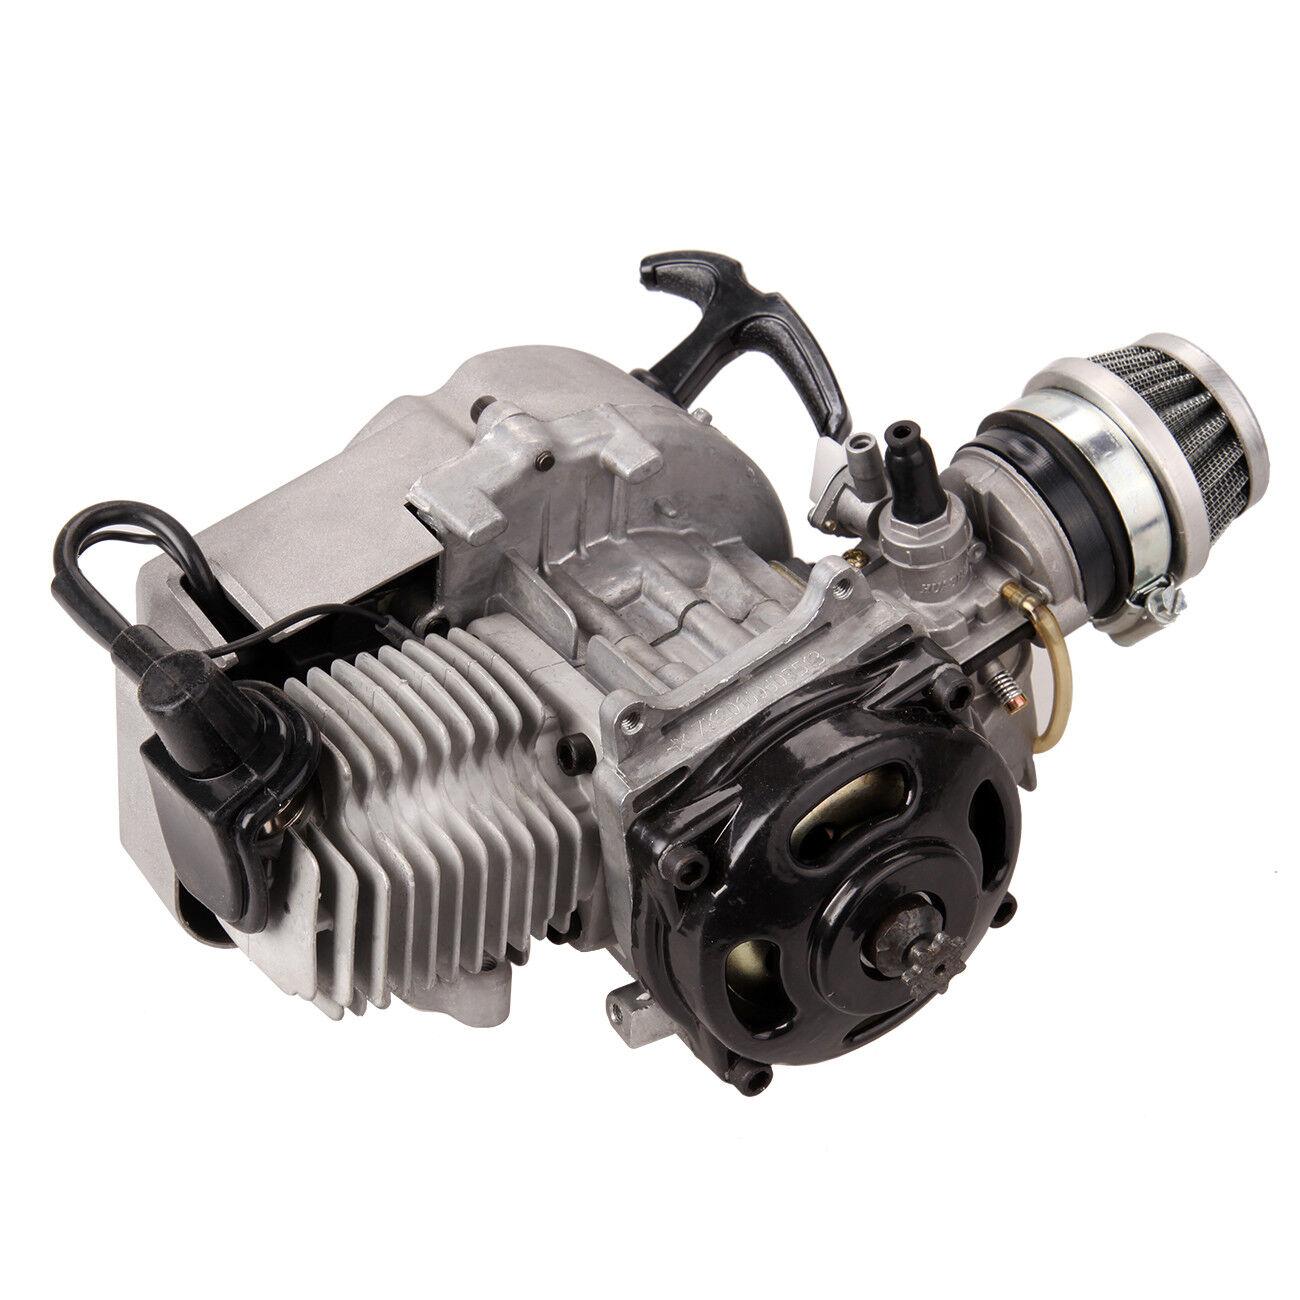 Motor 49CC Dirt Fahrrad Cross PocketFahrrad Kinderquad Mini Getriebe Vergaser NEU